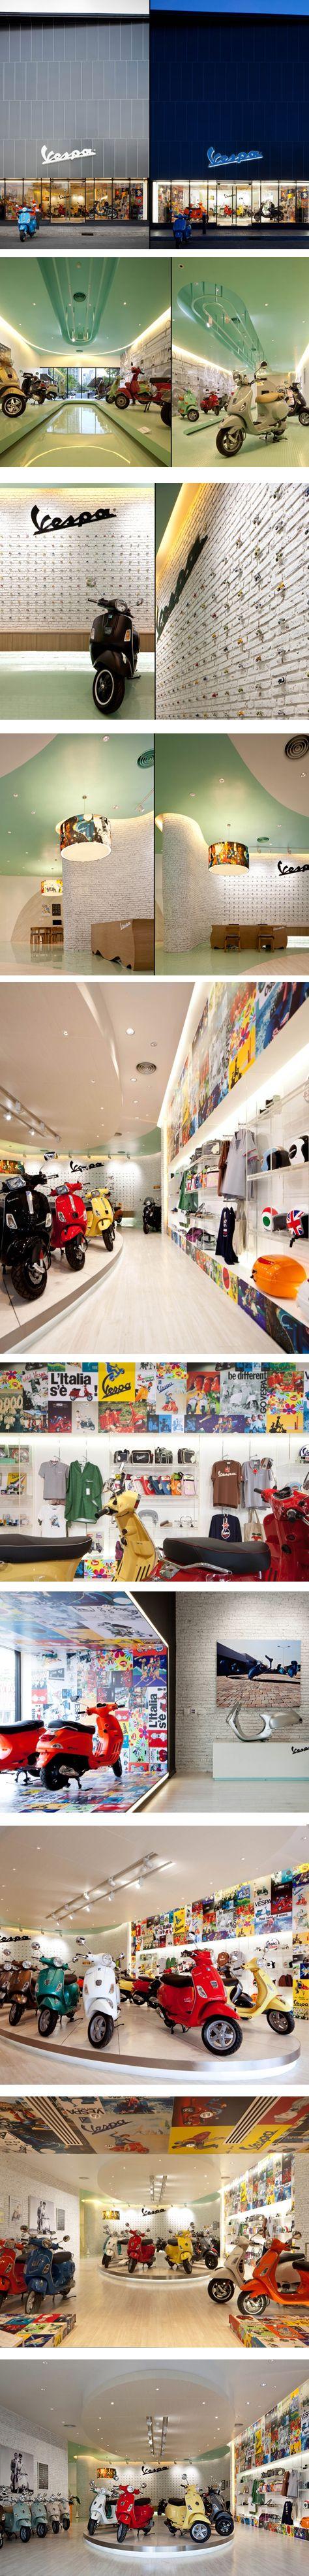 Vespa Gallery by Supermachine Studio, Bangkok – Thailand.